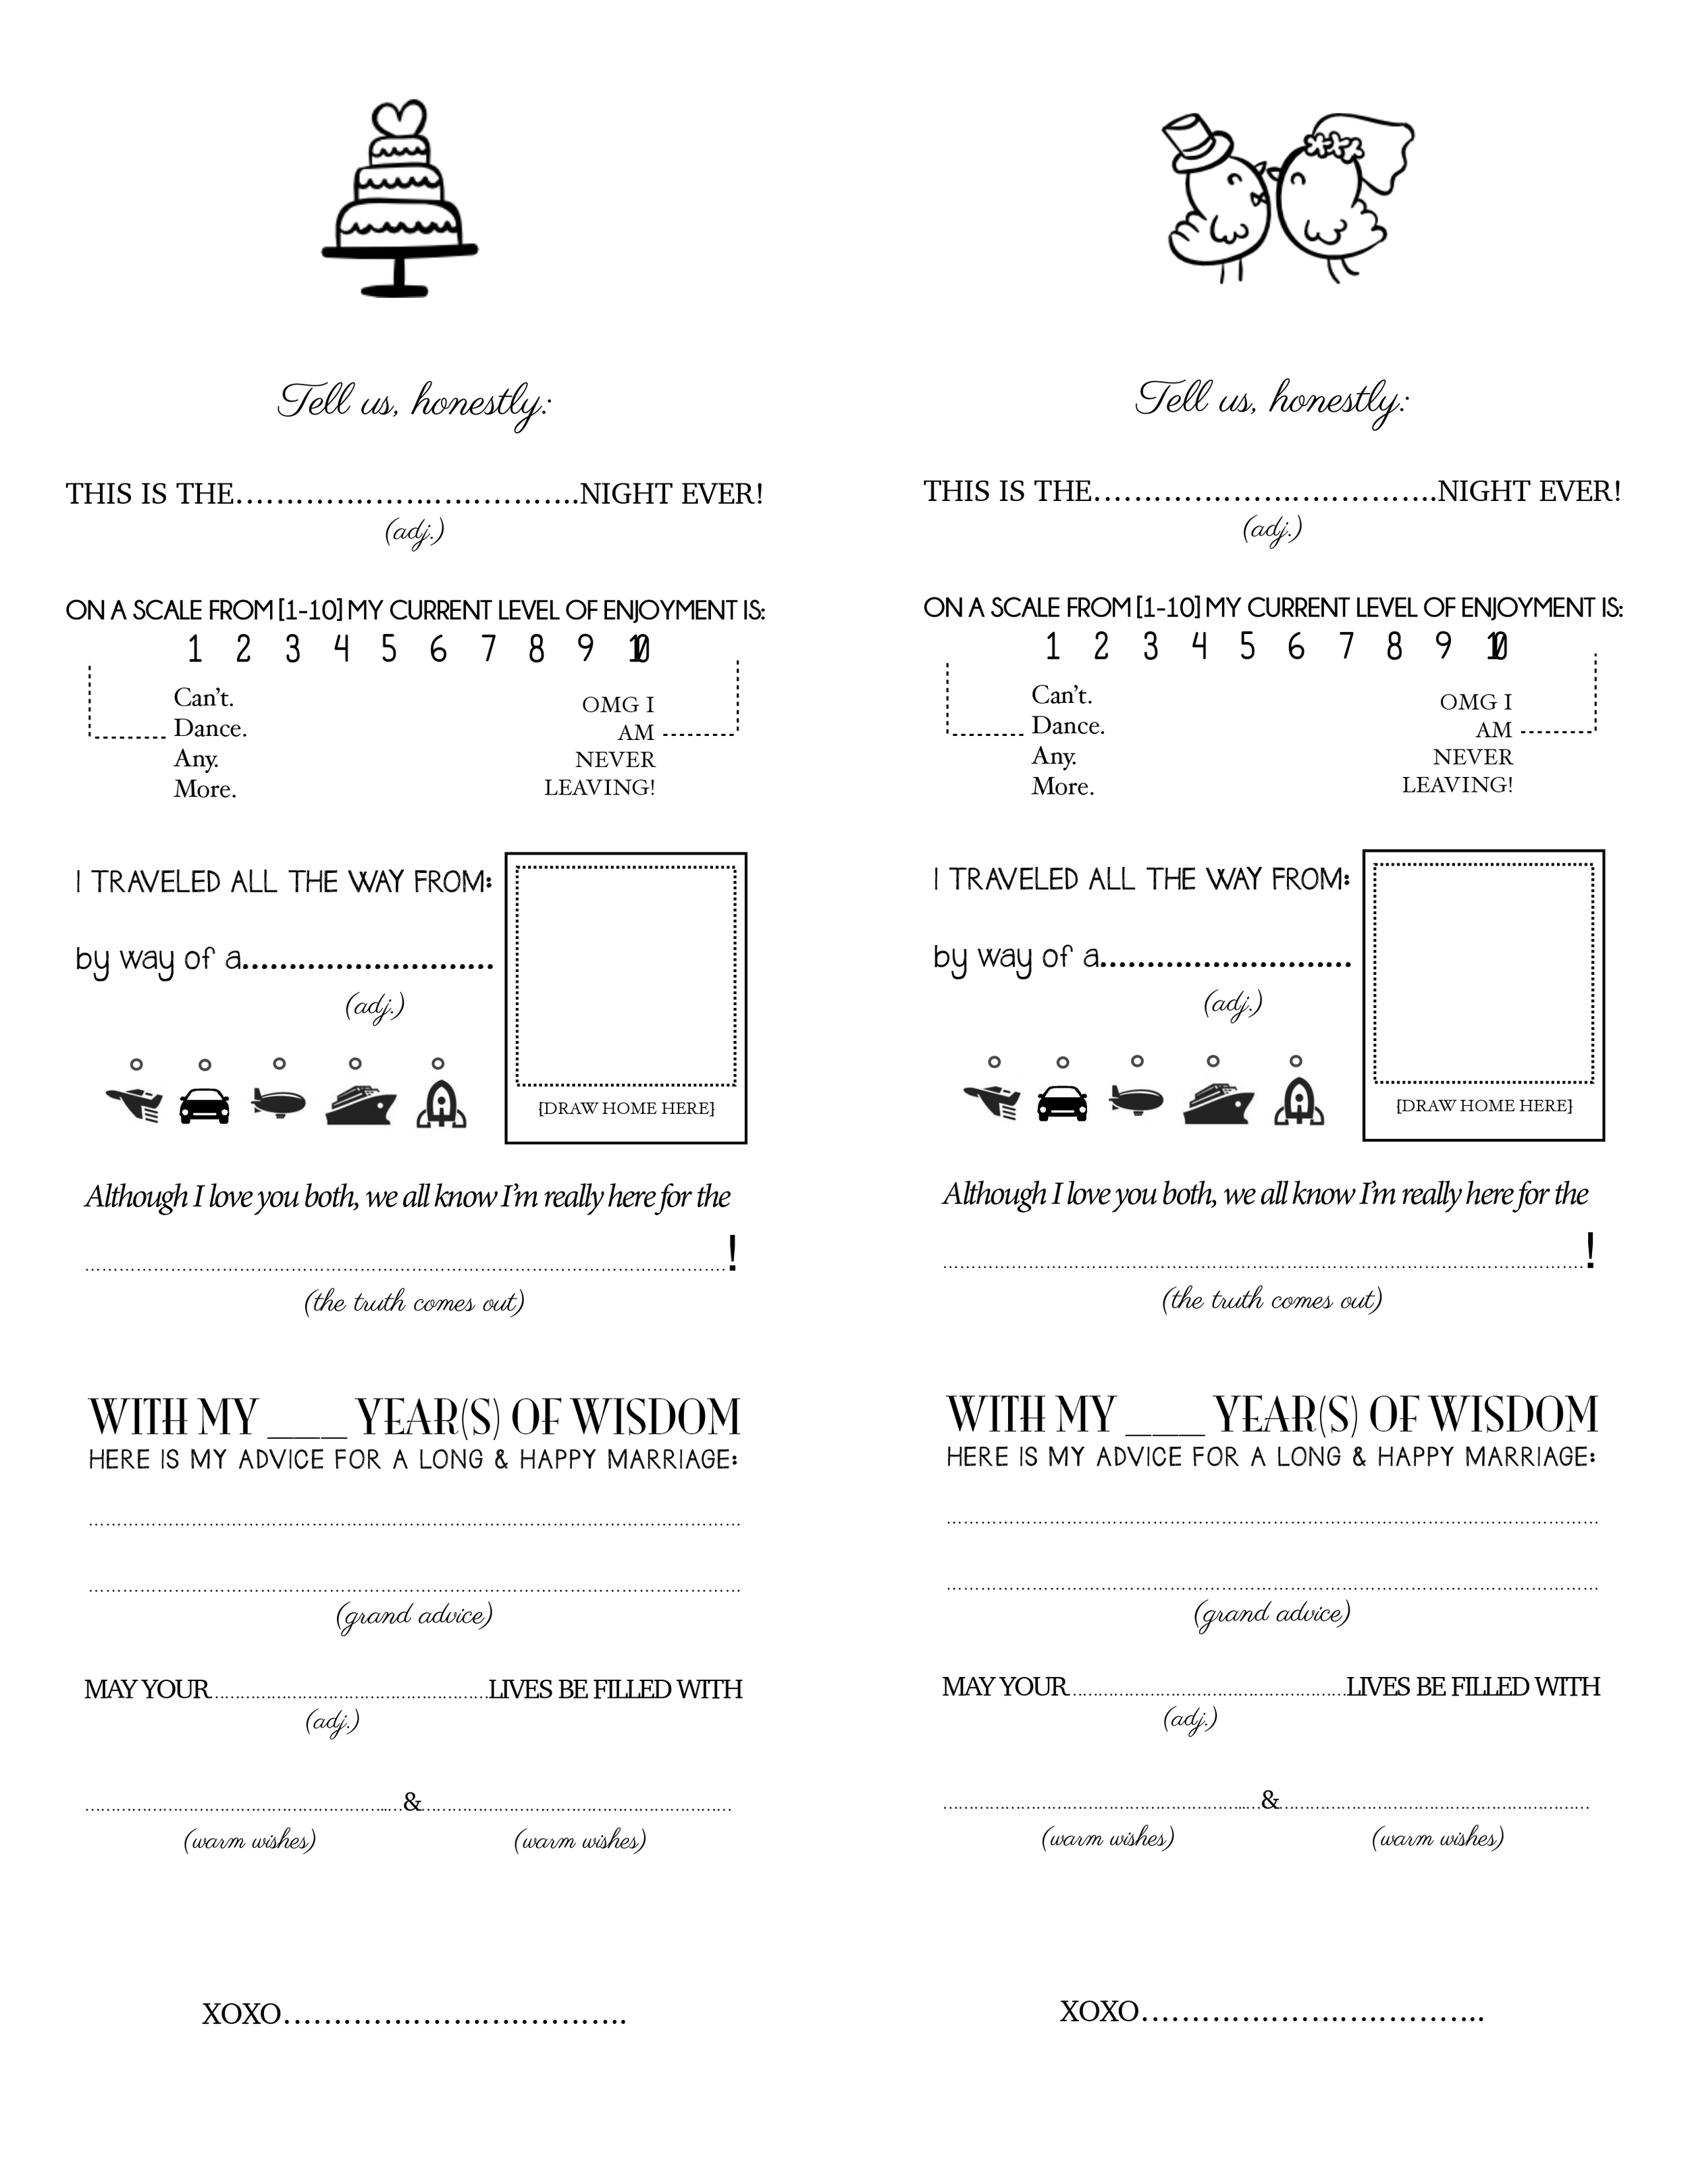 Photo Printable Surveys Images – Free Printable Questionnaire Template